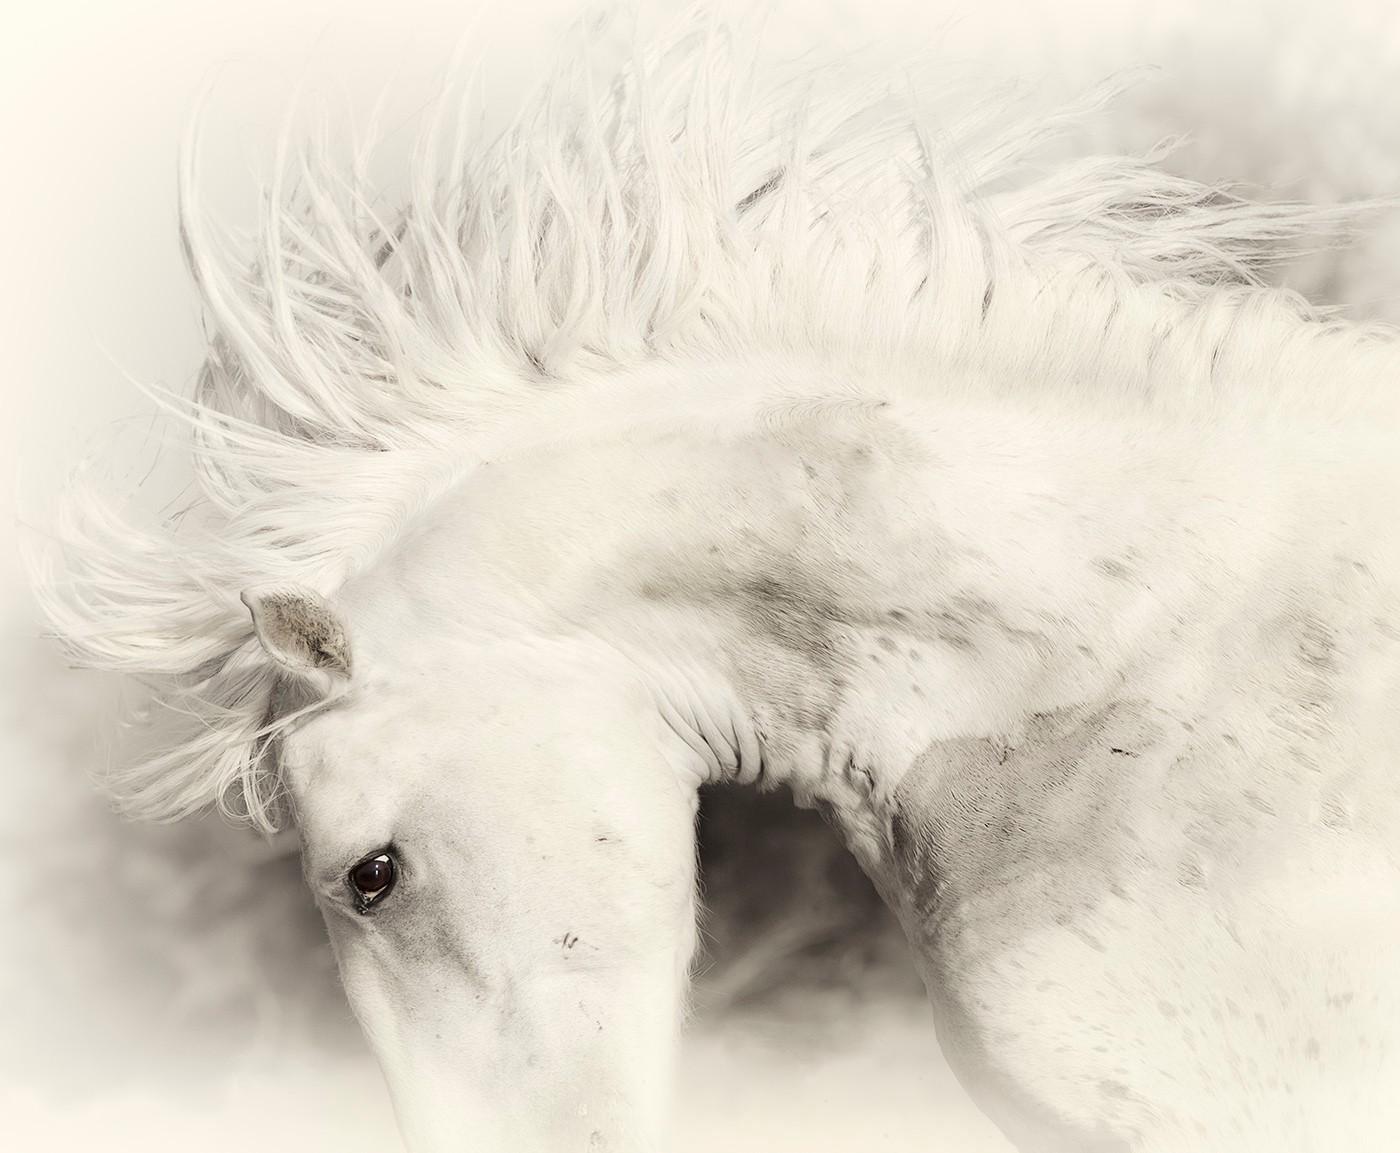 Stallion_Persona_4713_17x14_JMSilberman